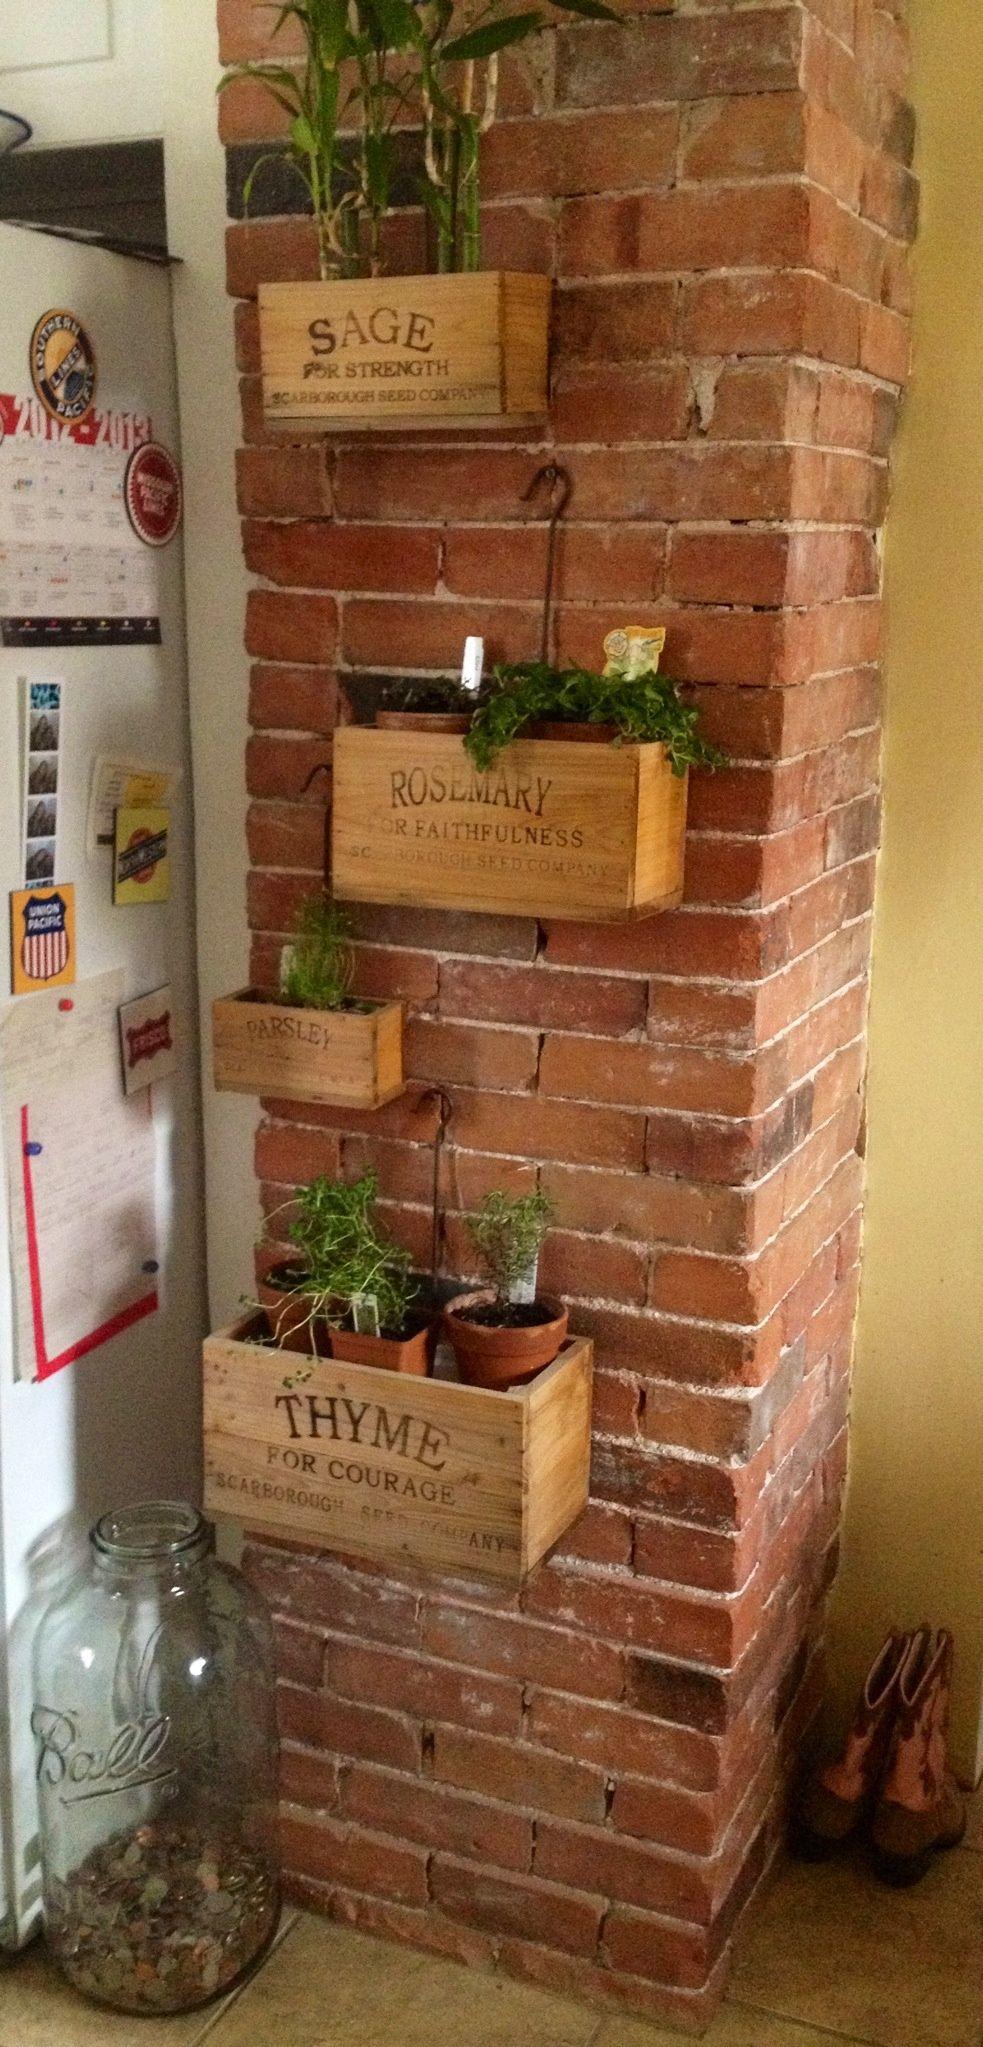 Lasered labeled pots Caren's laser? My Herb Garden